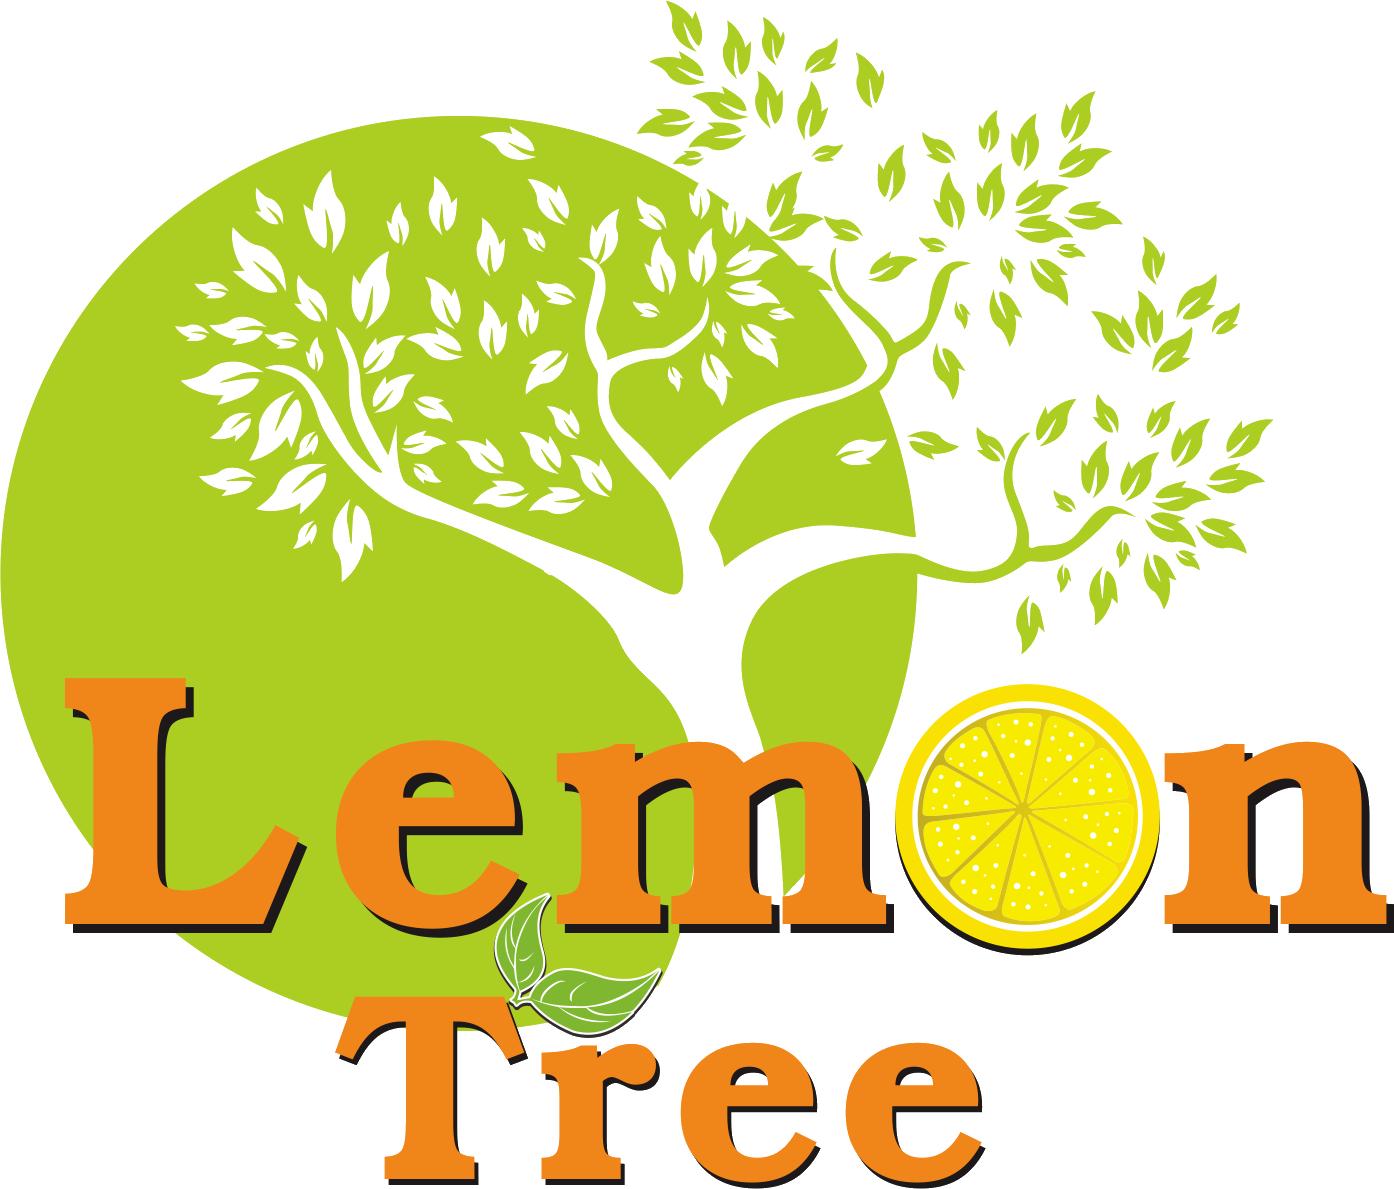 Attractive fools garden lemon. Lemons clipart citrus tree